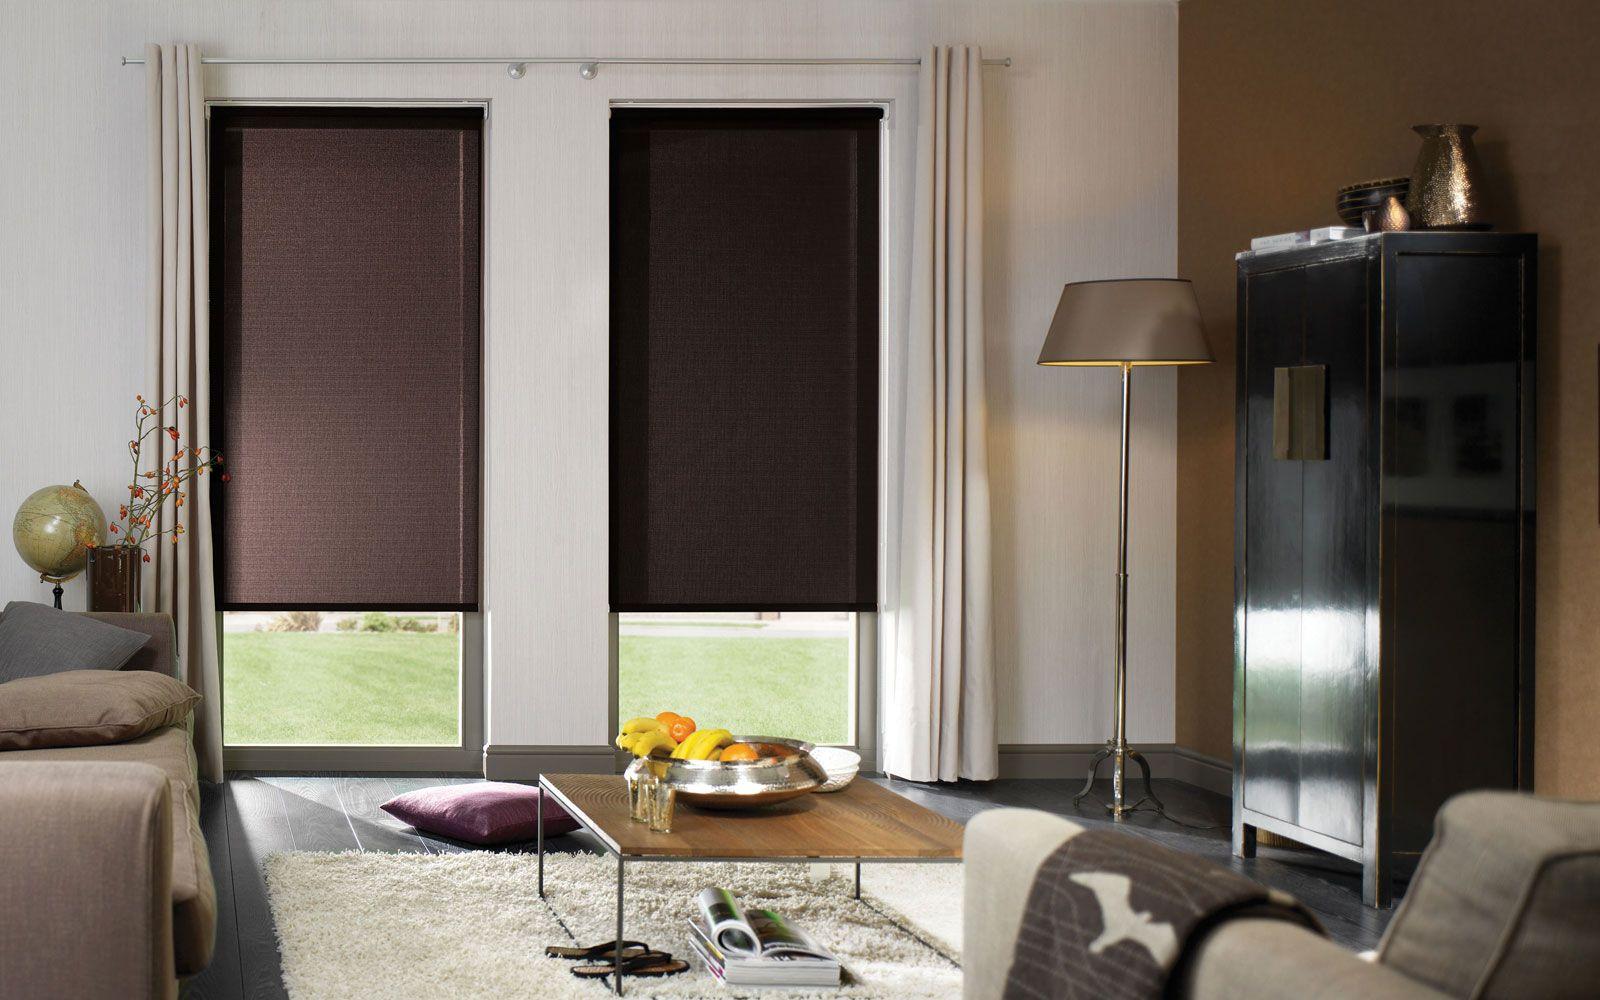 Blackout Bedroom Blinds Custom Classic Sleek Grey Ikea Blackout Blinds For Clean Modern Living Decorating Inspiration